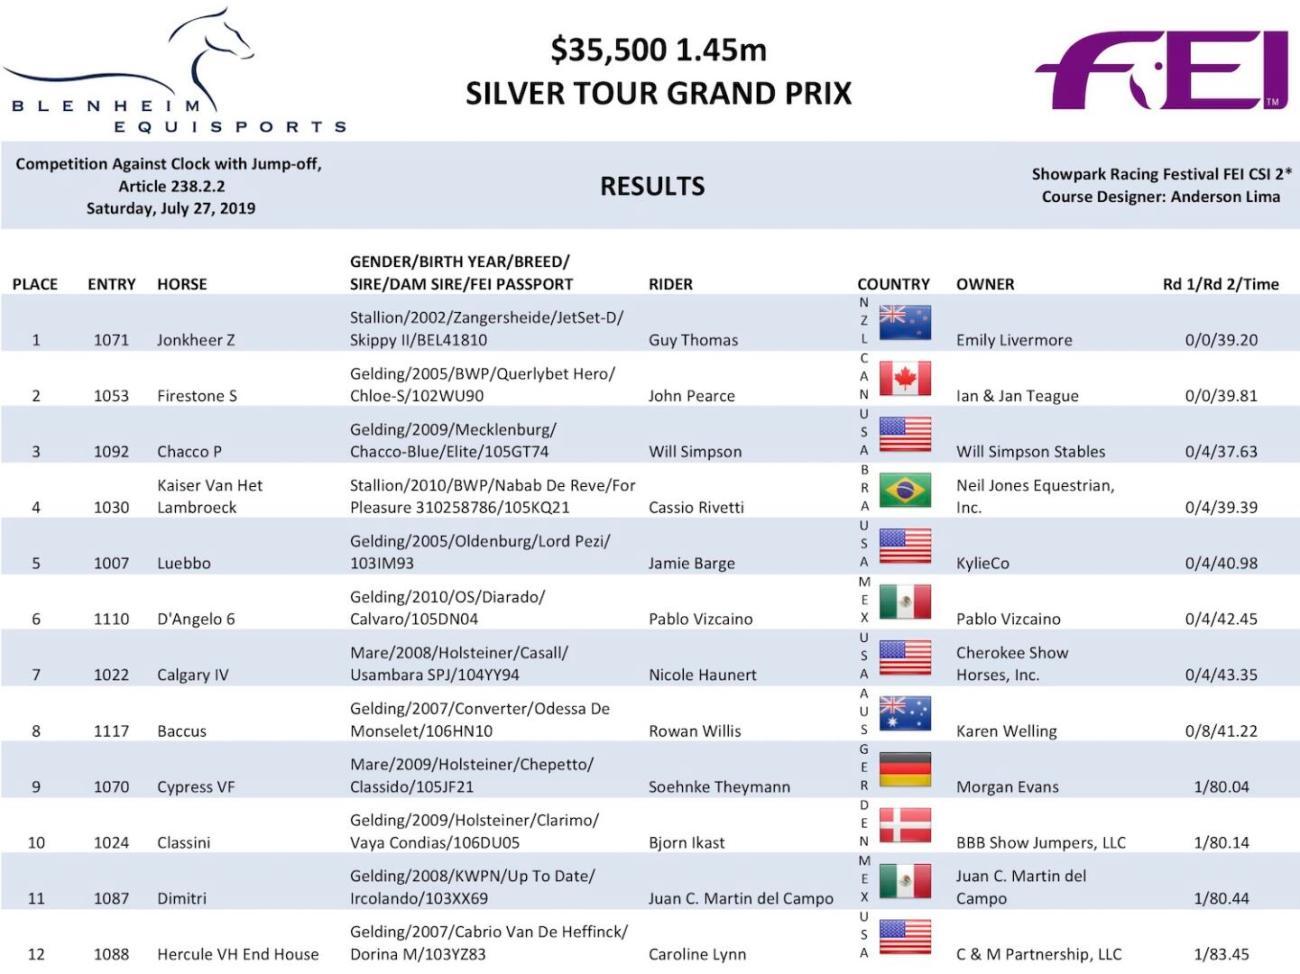 2019.07.30.99.99 Showpark Racing Festival CSI 2 GP Results